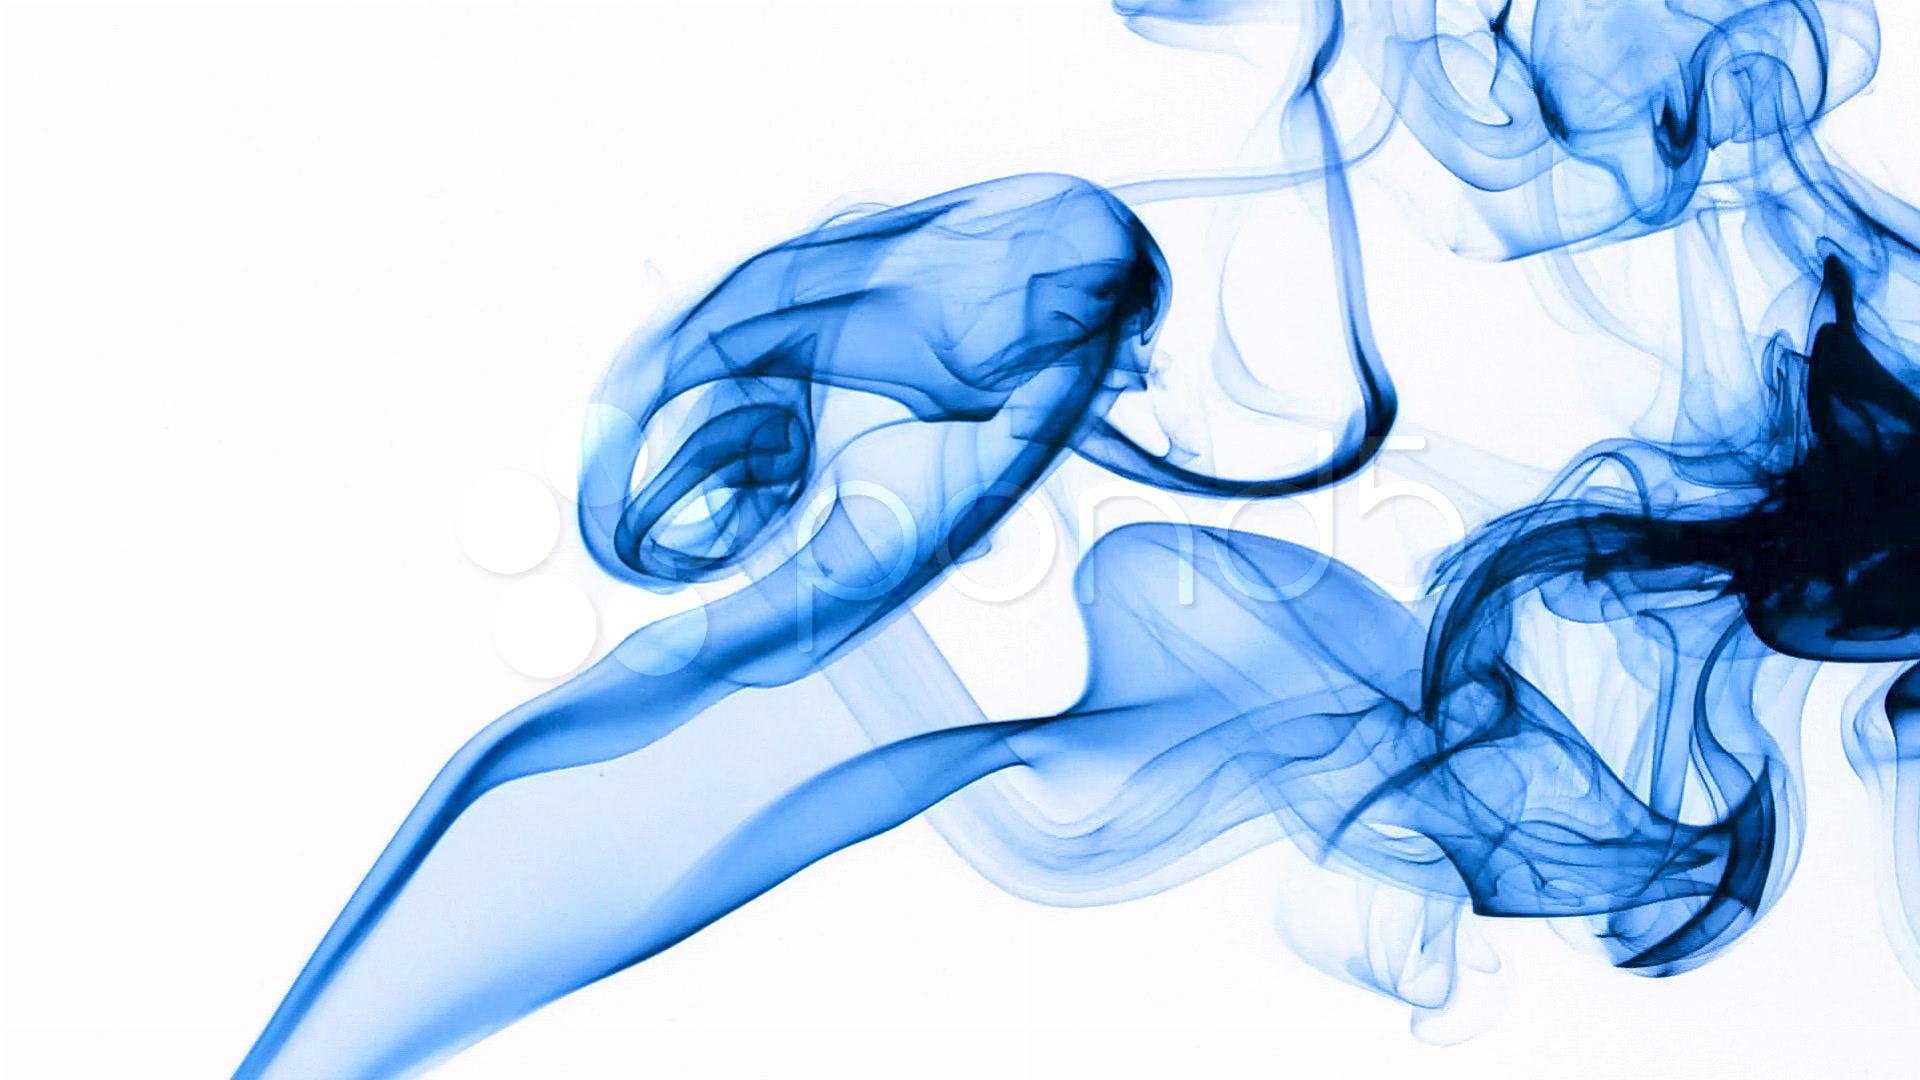 Blue smoke ~ SD, HD, & 4K Stock Footage #315533   Pond5